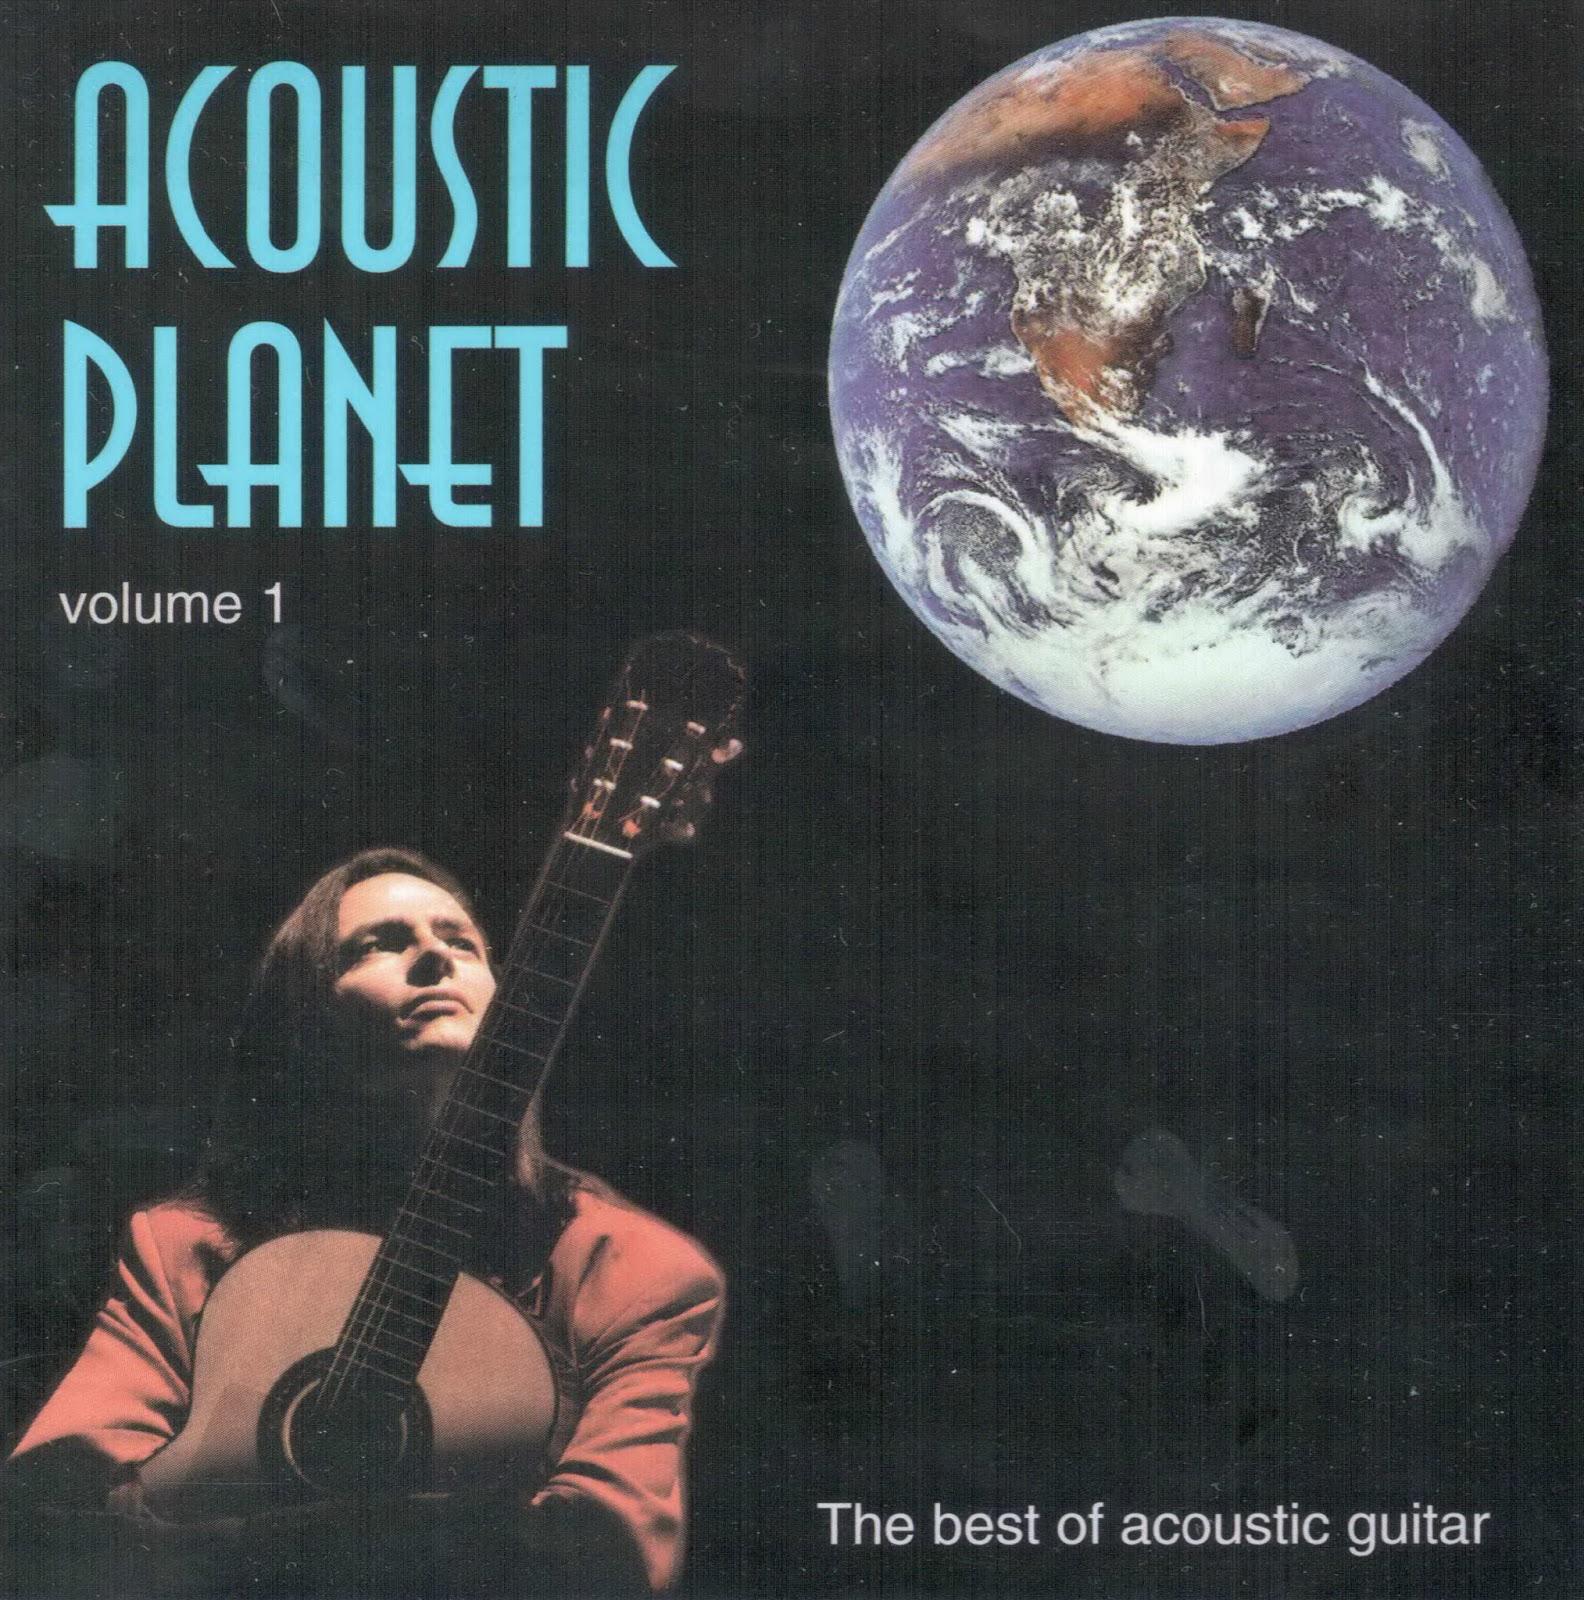 Acoustic Flac